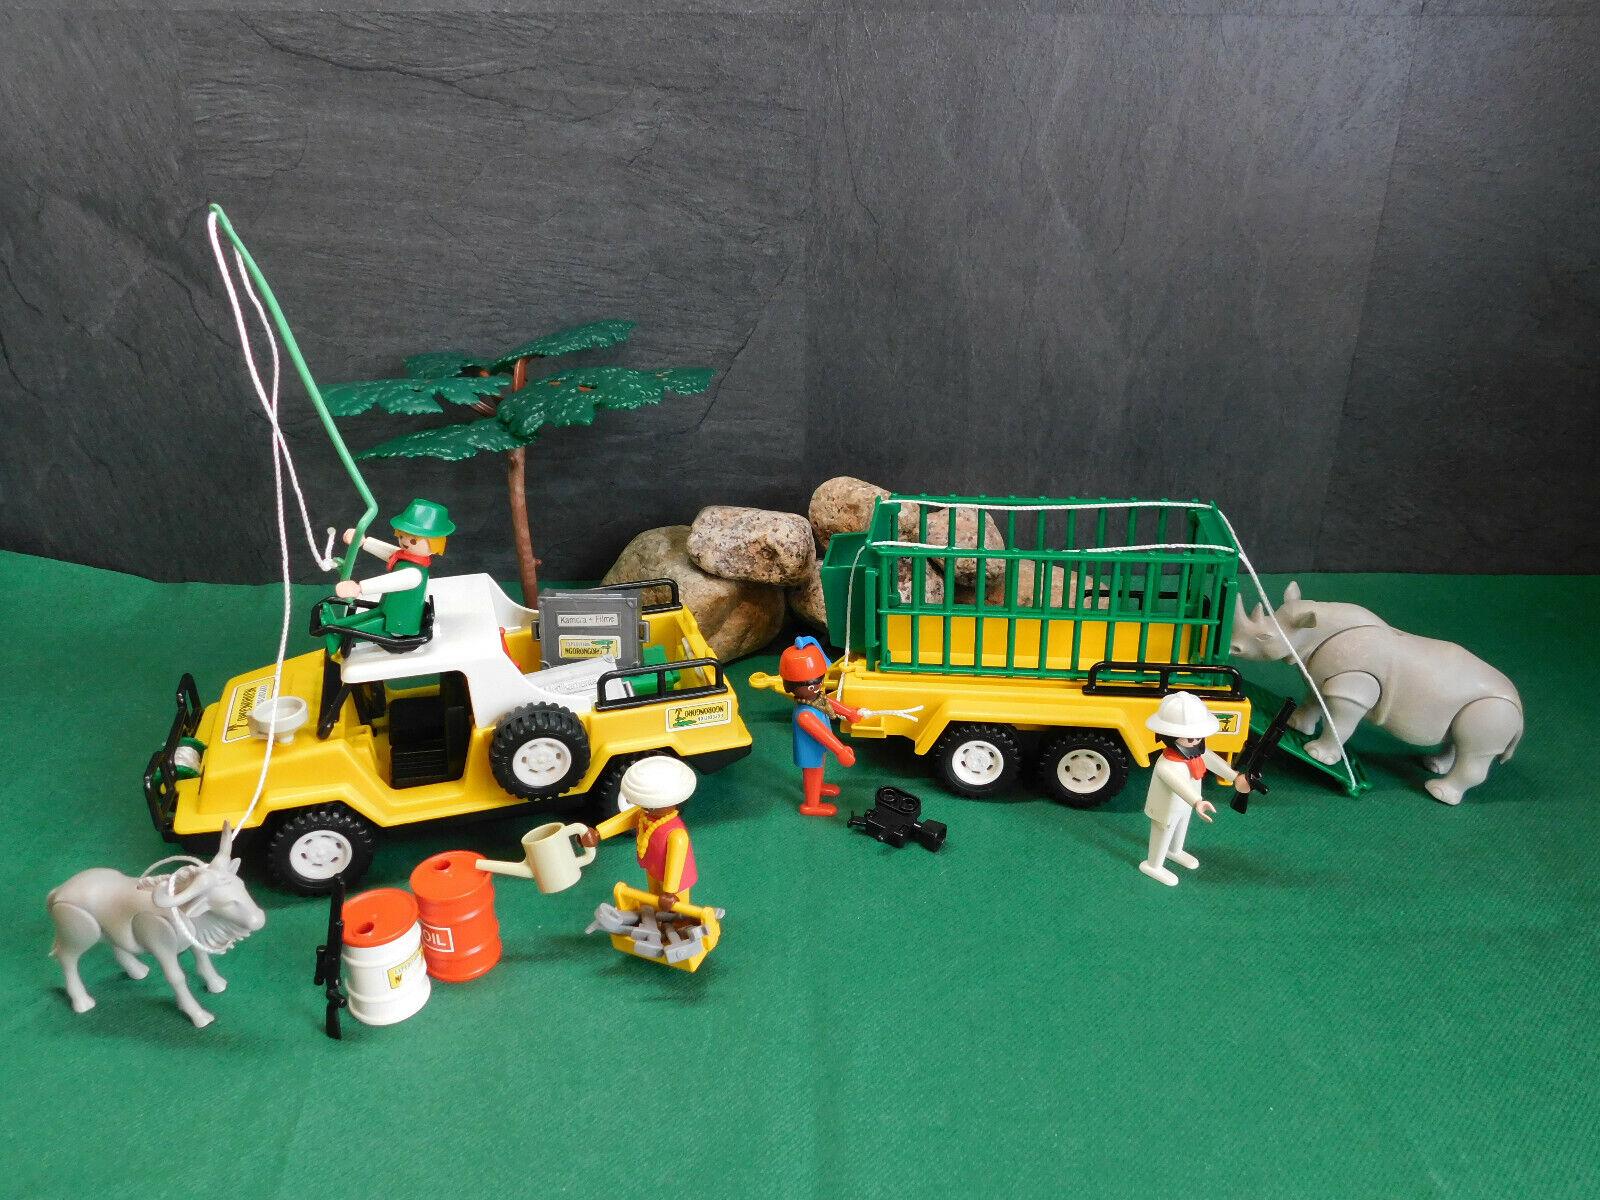 Playmobil Rarität Safari-Car 3528-A 1980 u. Safari-Anhänger 3529-A 1980 II